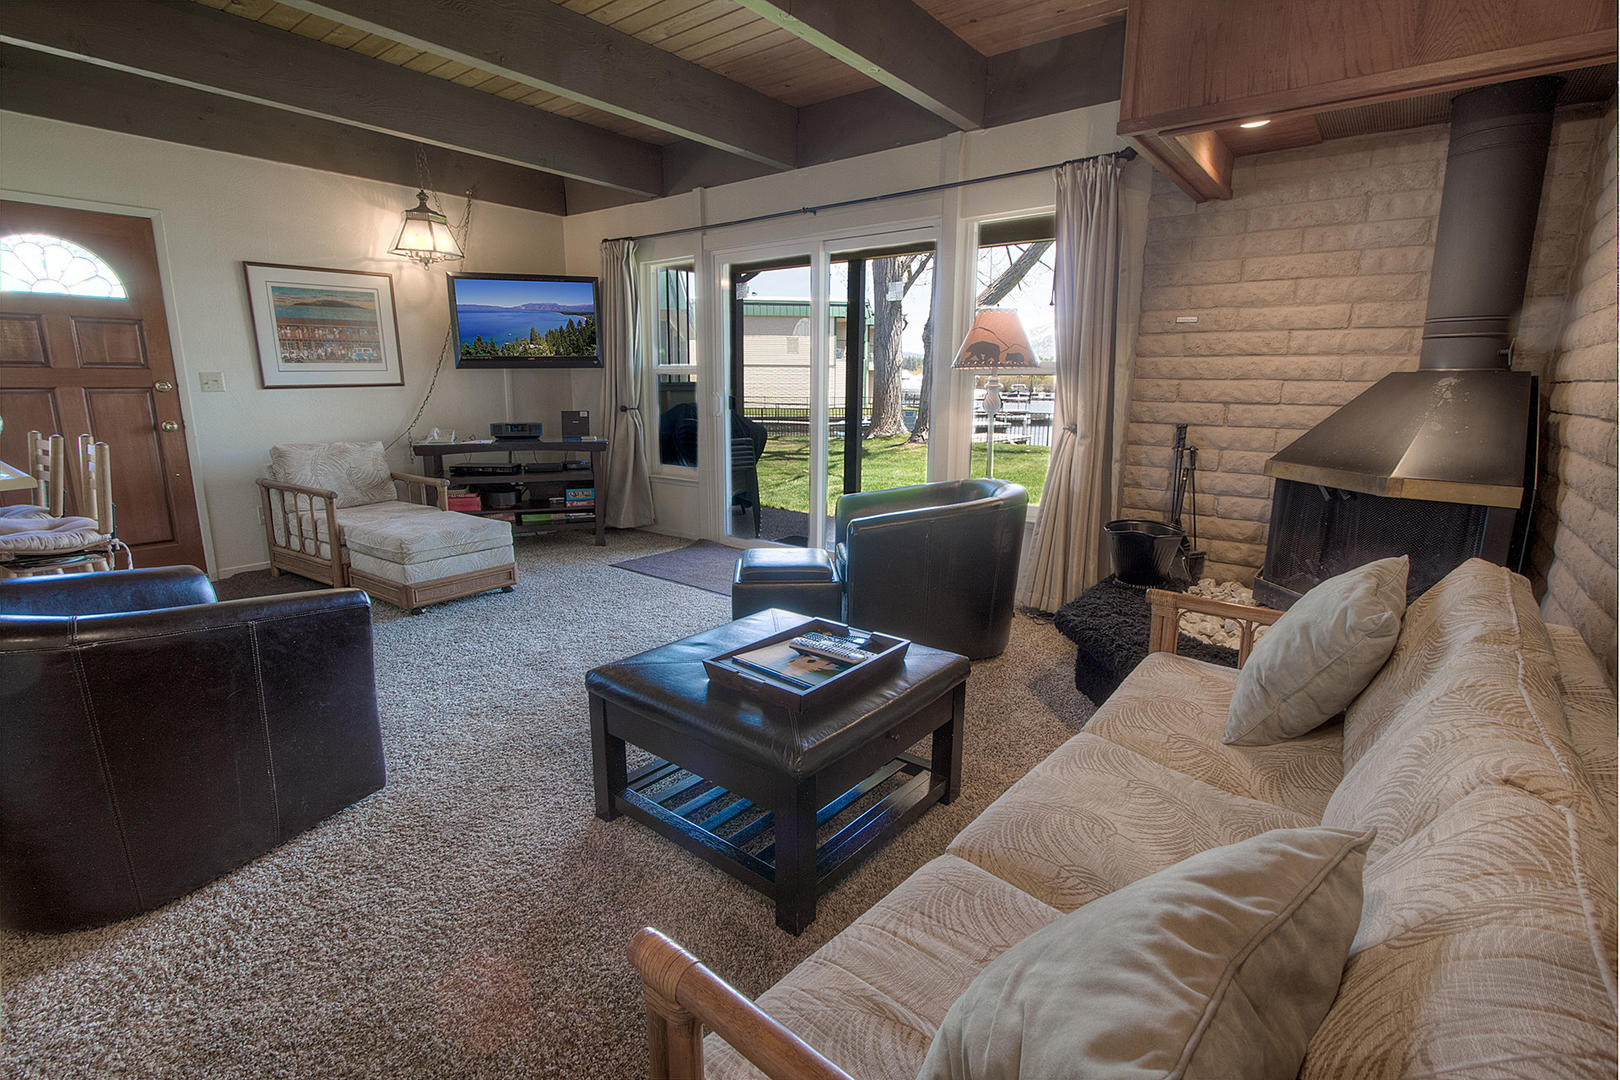 tkc0604 living room